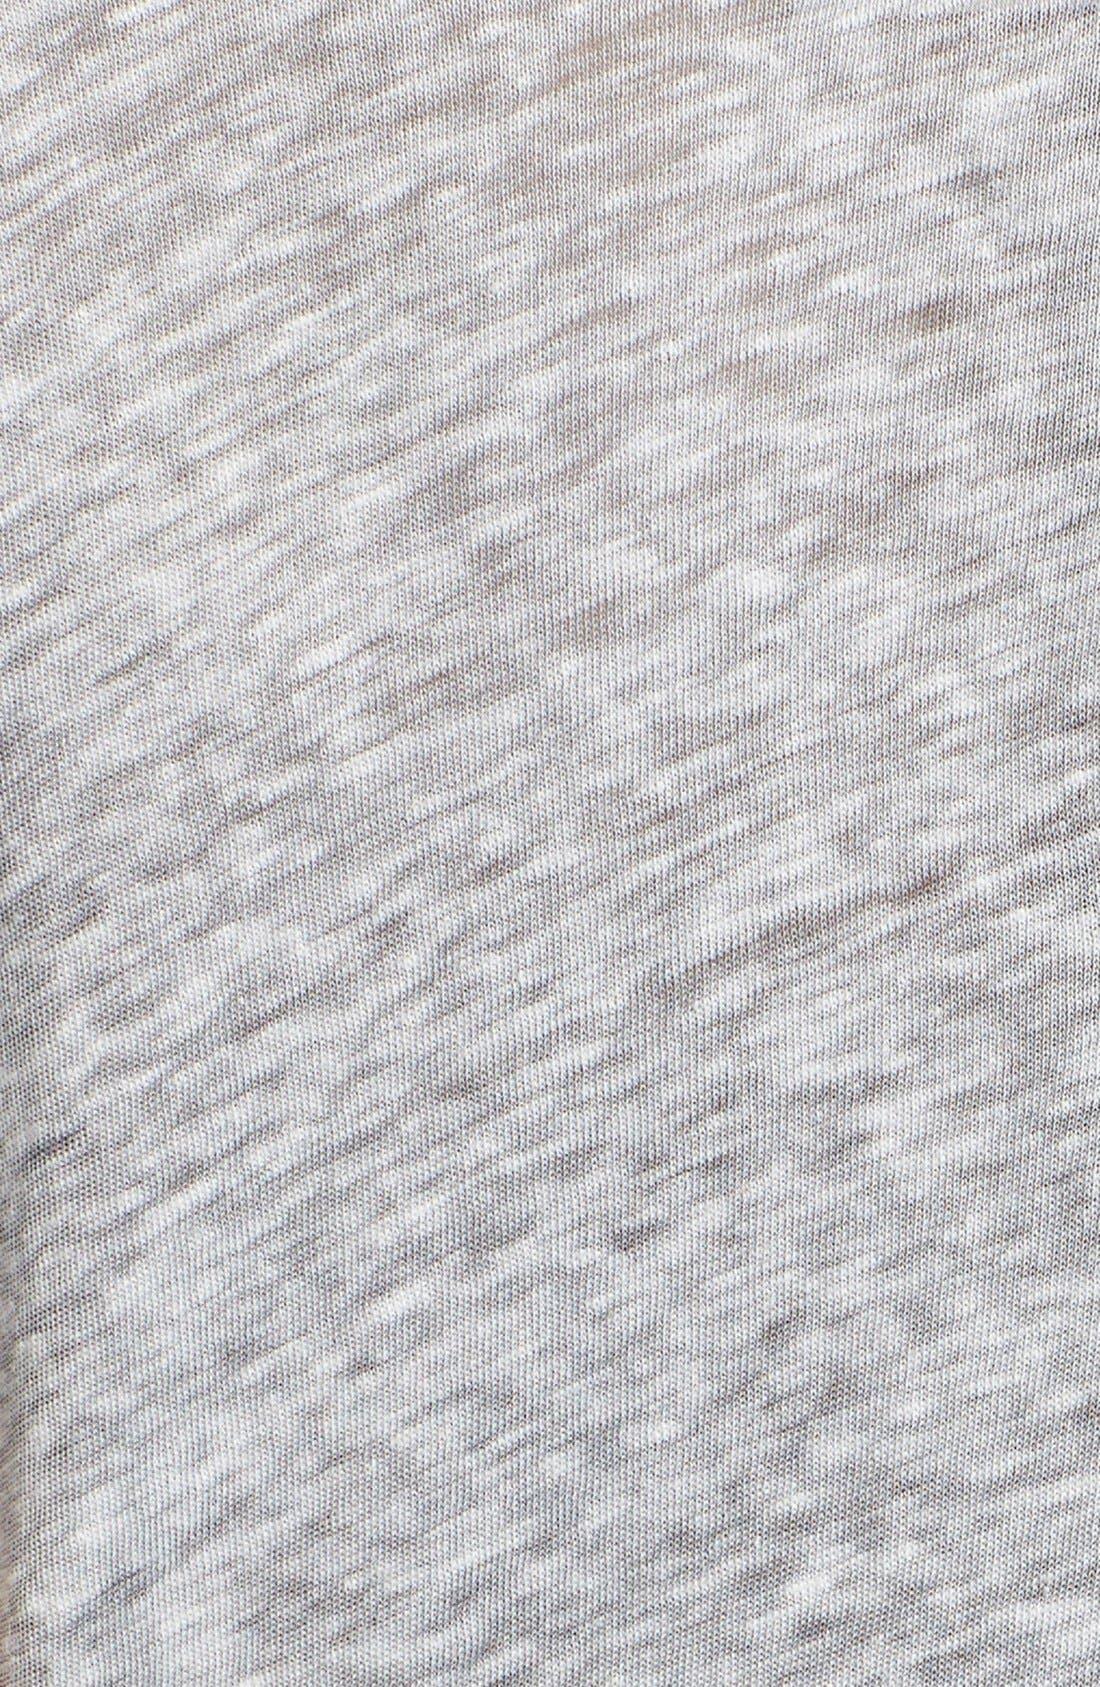 Alternate Image 5  - Current/Elliott 'The Petit' Linen & Cotton Tee